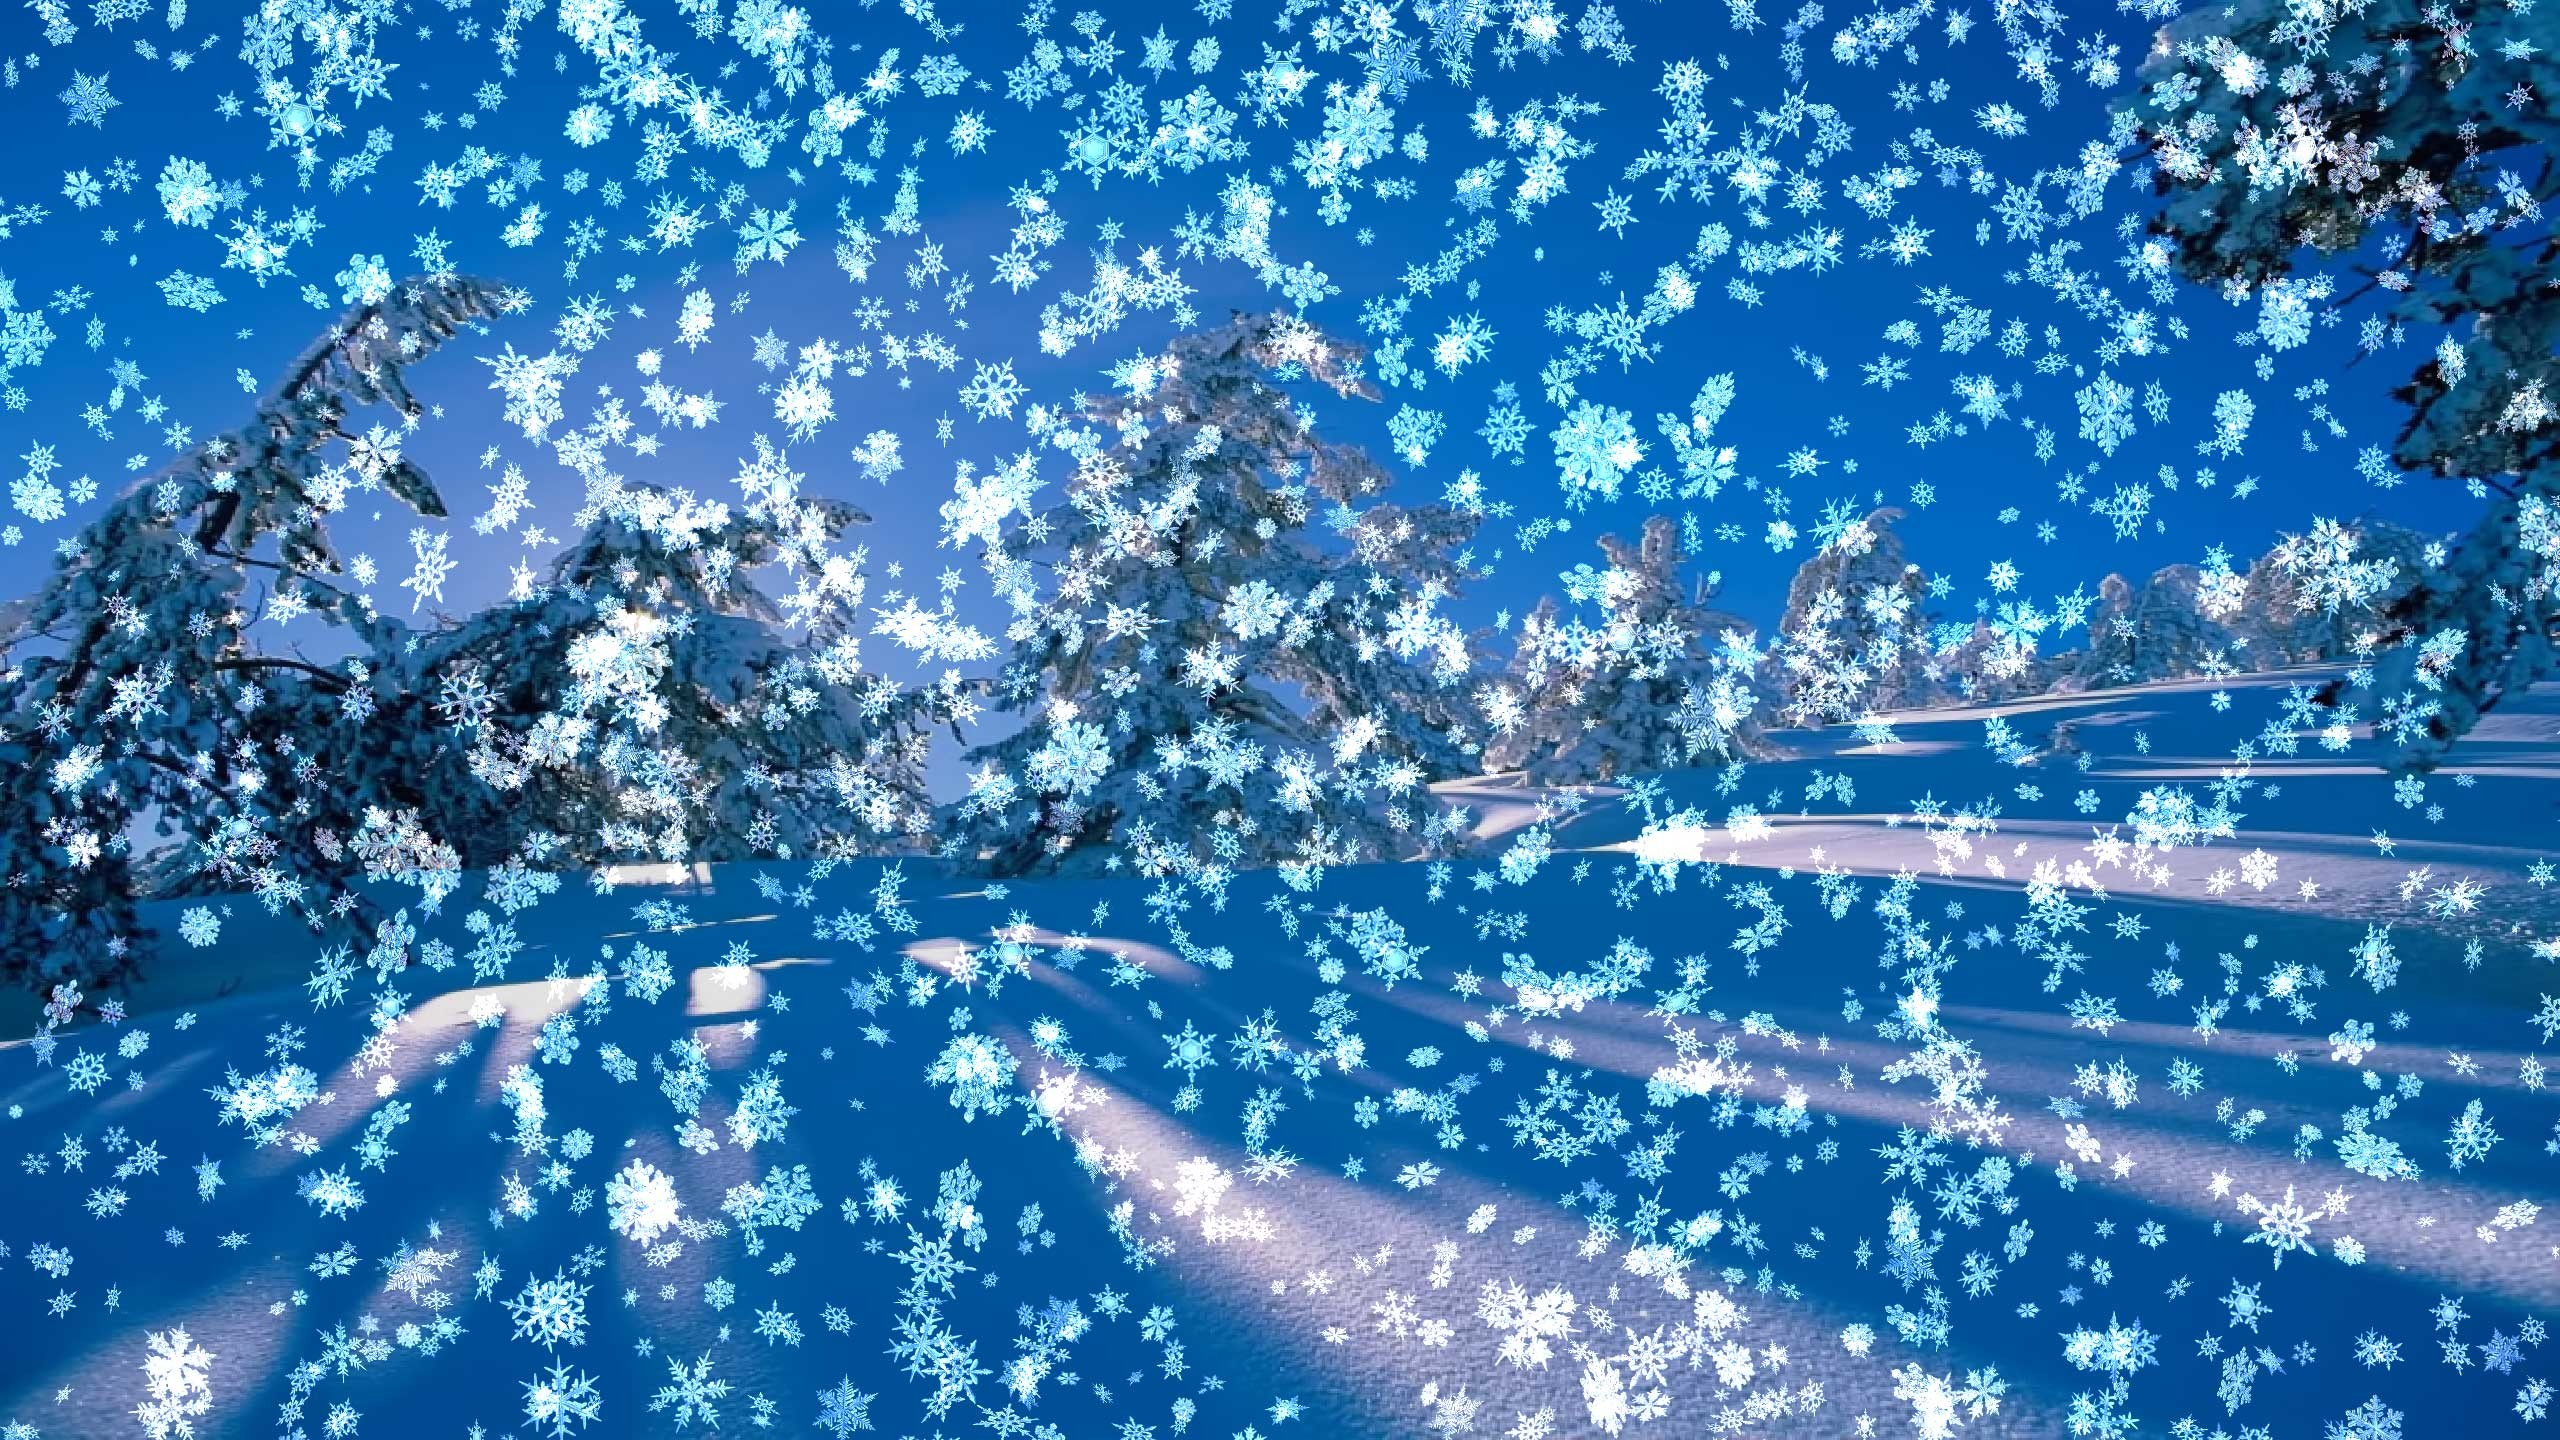 2560x1440 Snowy Desktop 3D